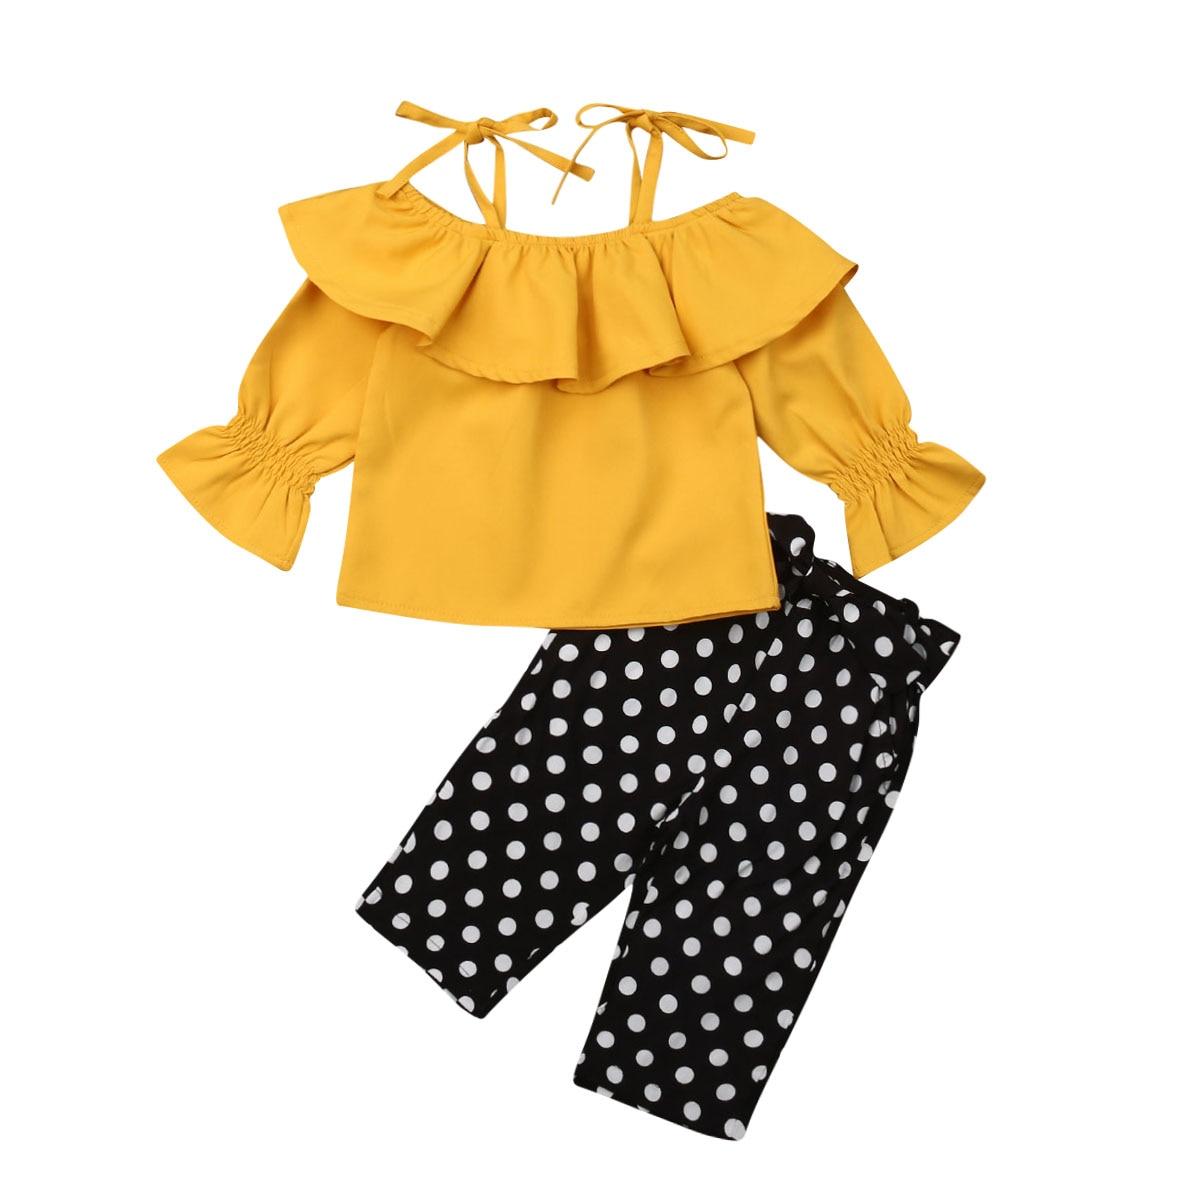 2PCS Toddler Kid Baby Girl Dot Long Sleeve Top Tee Solid Shorts Pants Outfit Set